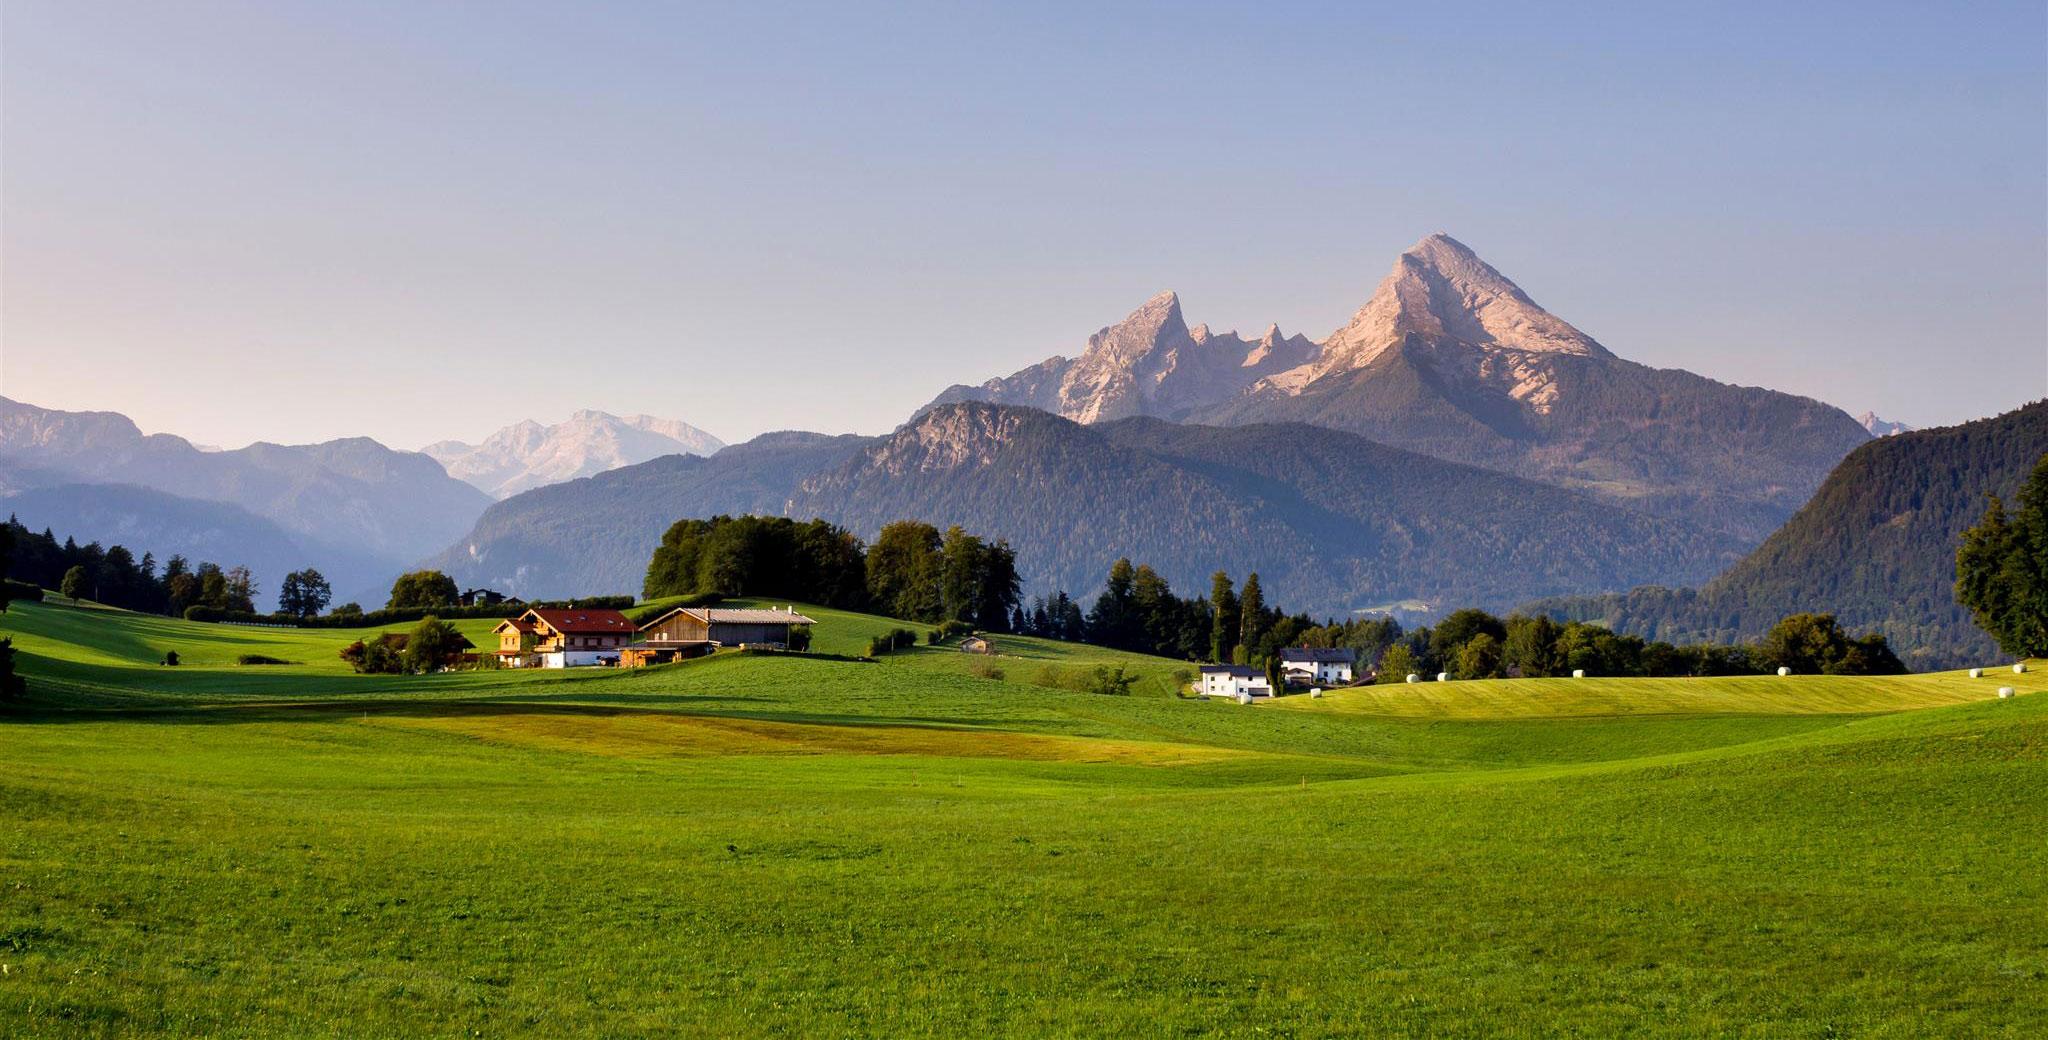 Hintergrund Berglandschaft Berchtesgaden